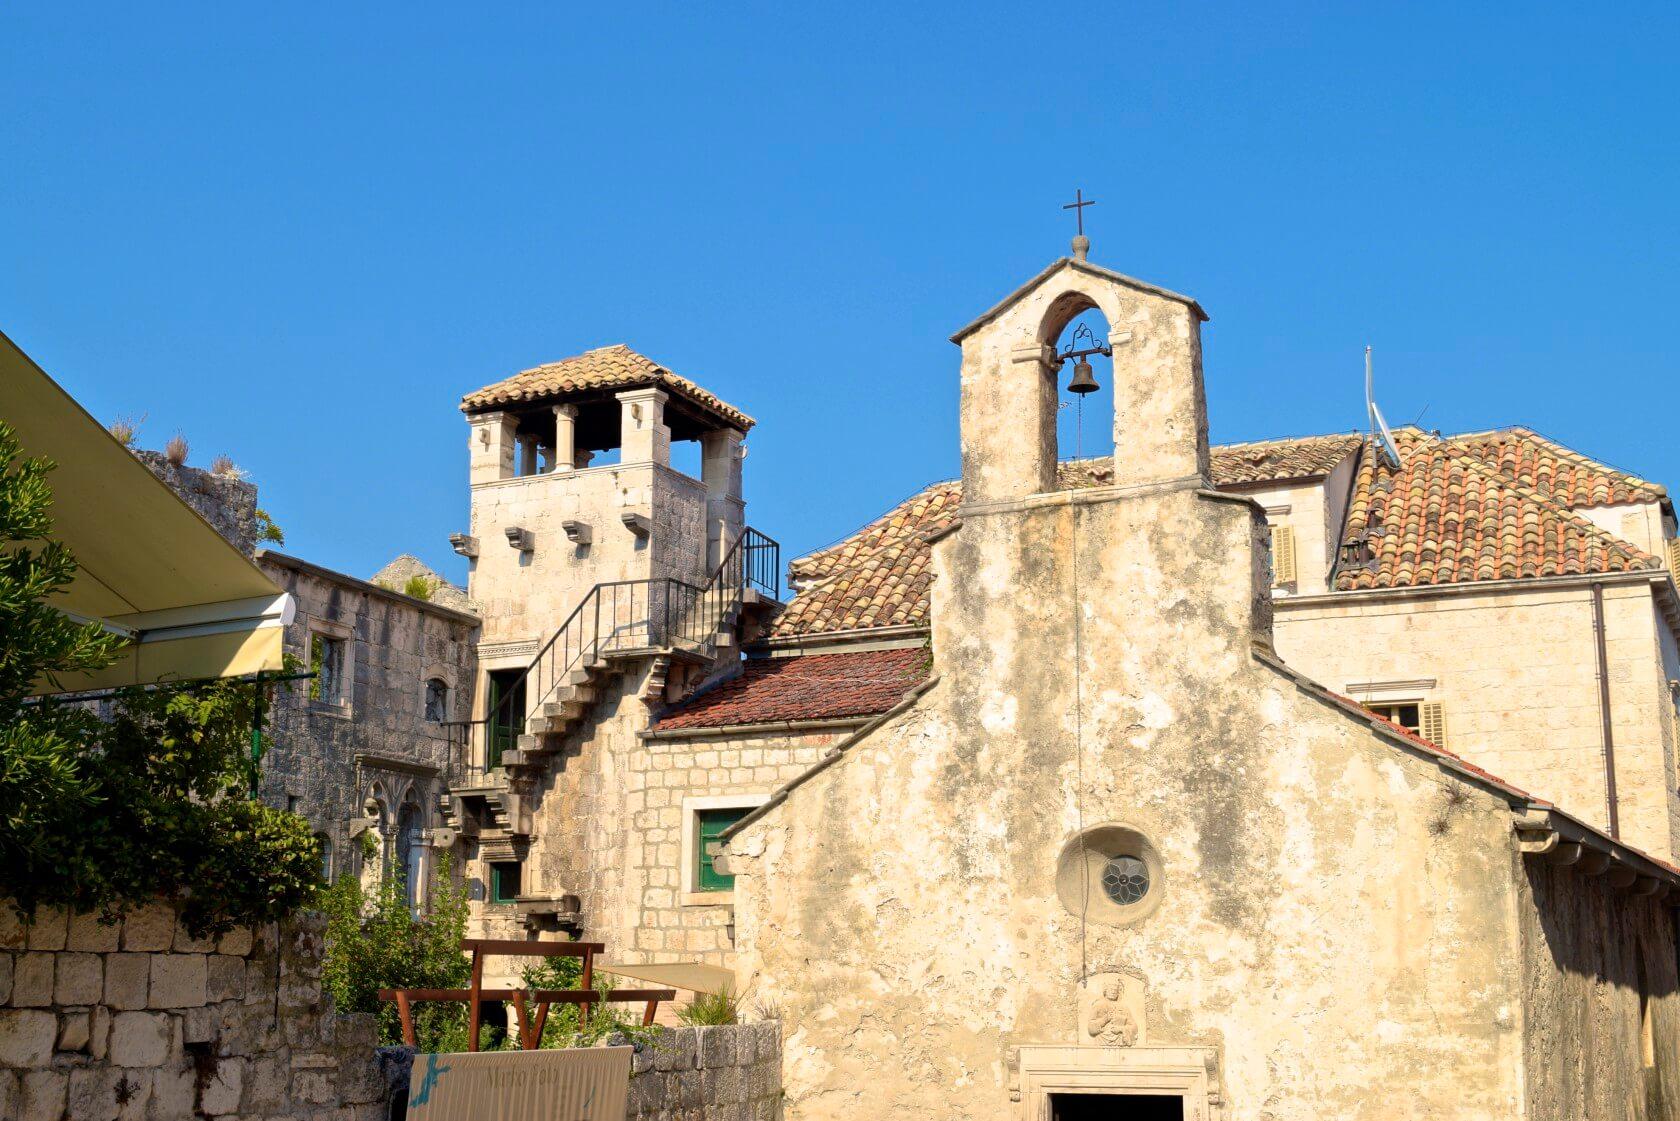 marco polo's birthplace and museum korcula croatia